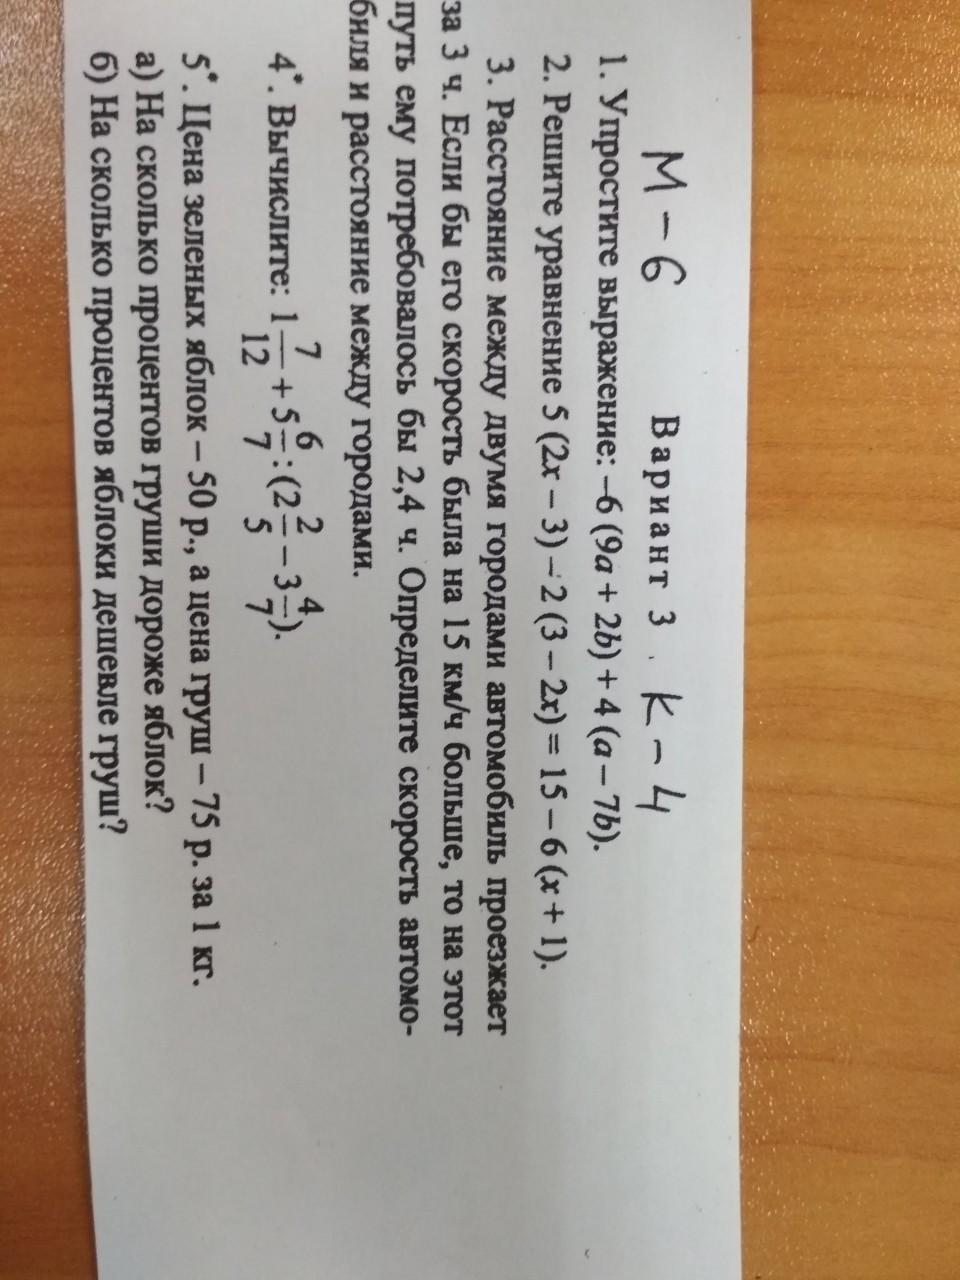 3 и 4 задачу решите, пожалуйста!